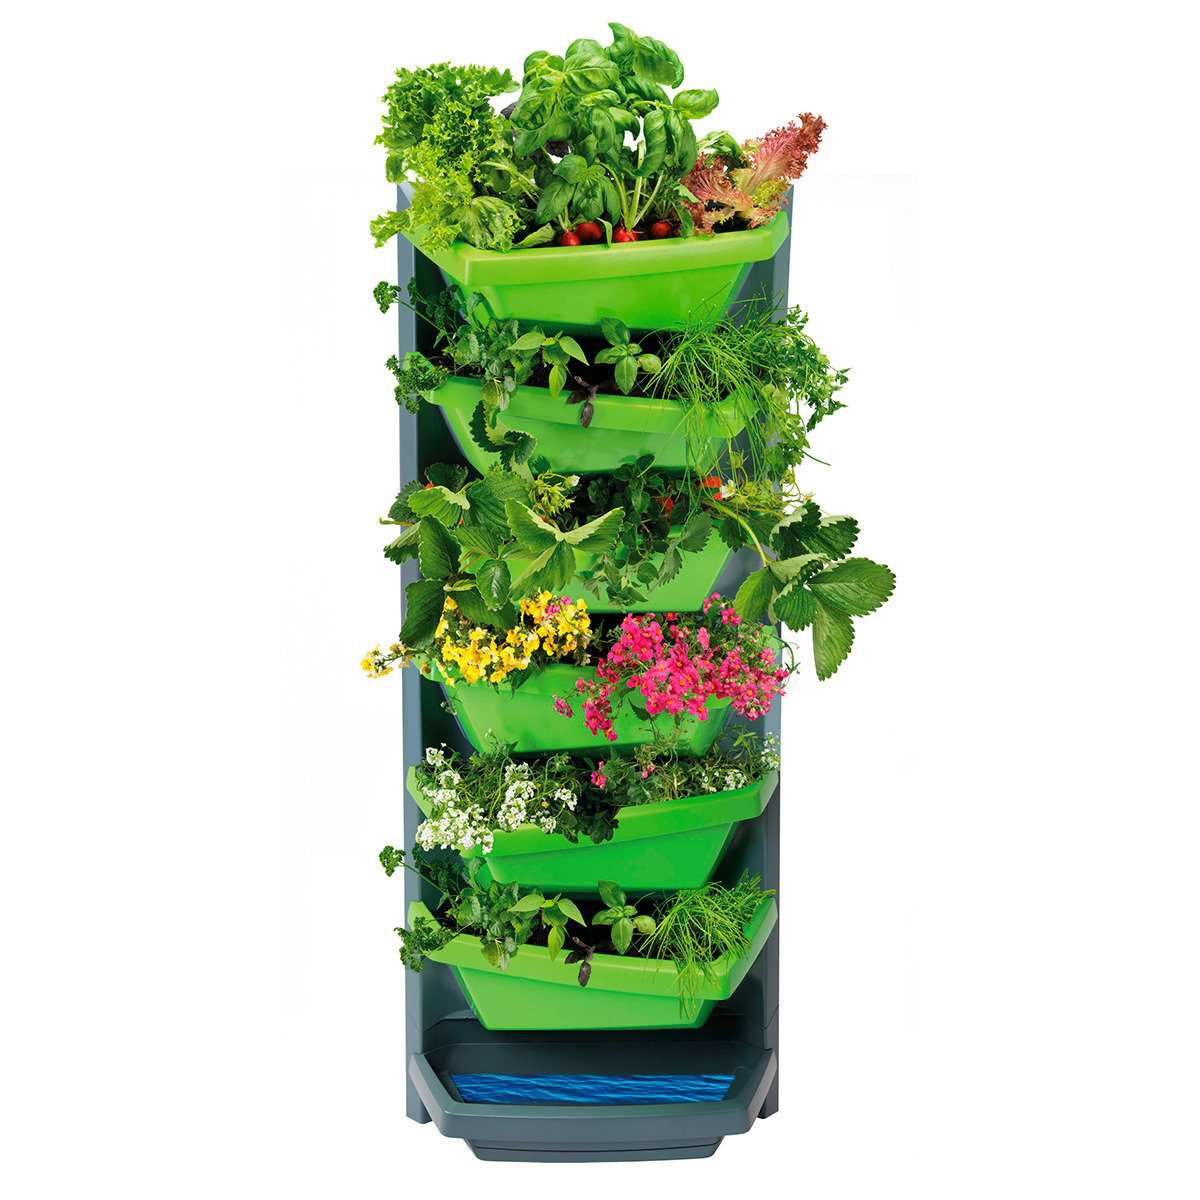 JUWEL Vertical Garden Aufbauelement, limette | #3